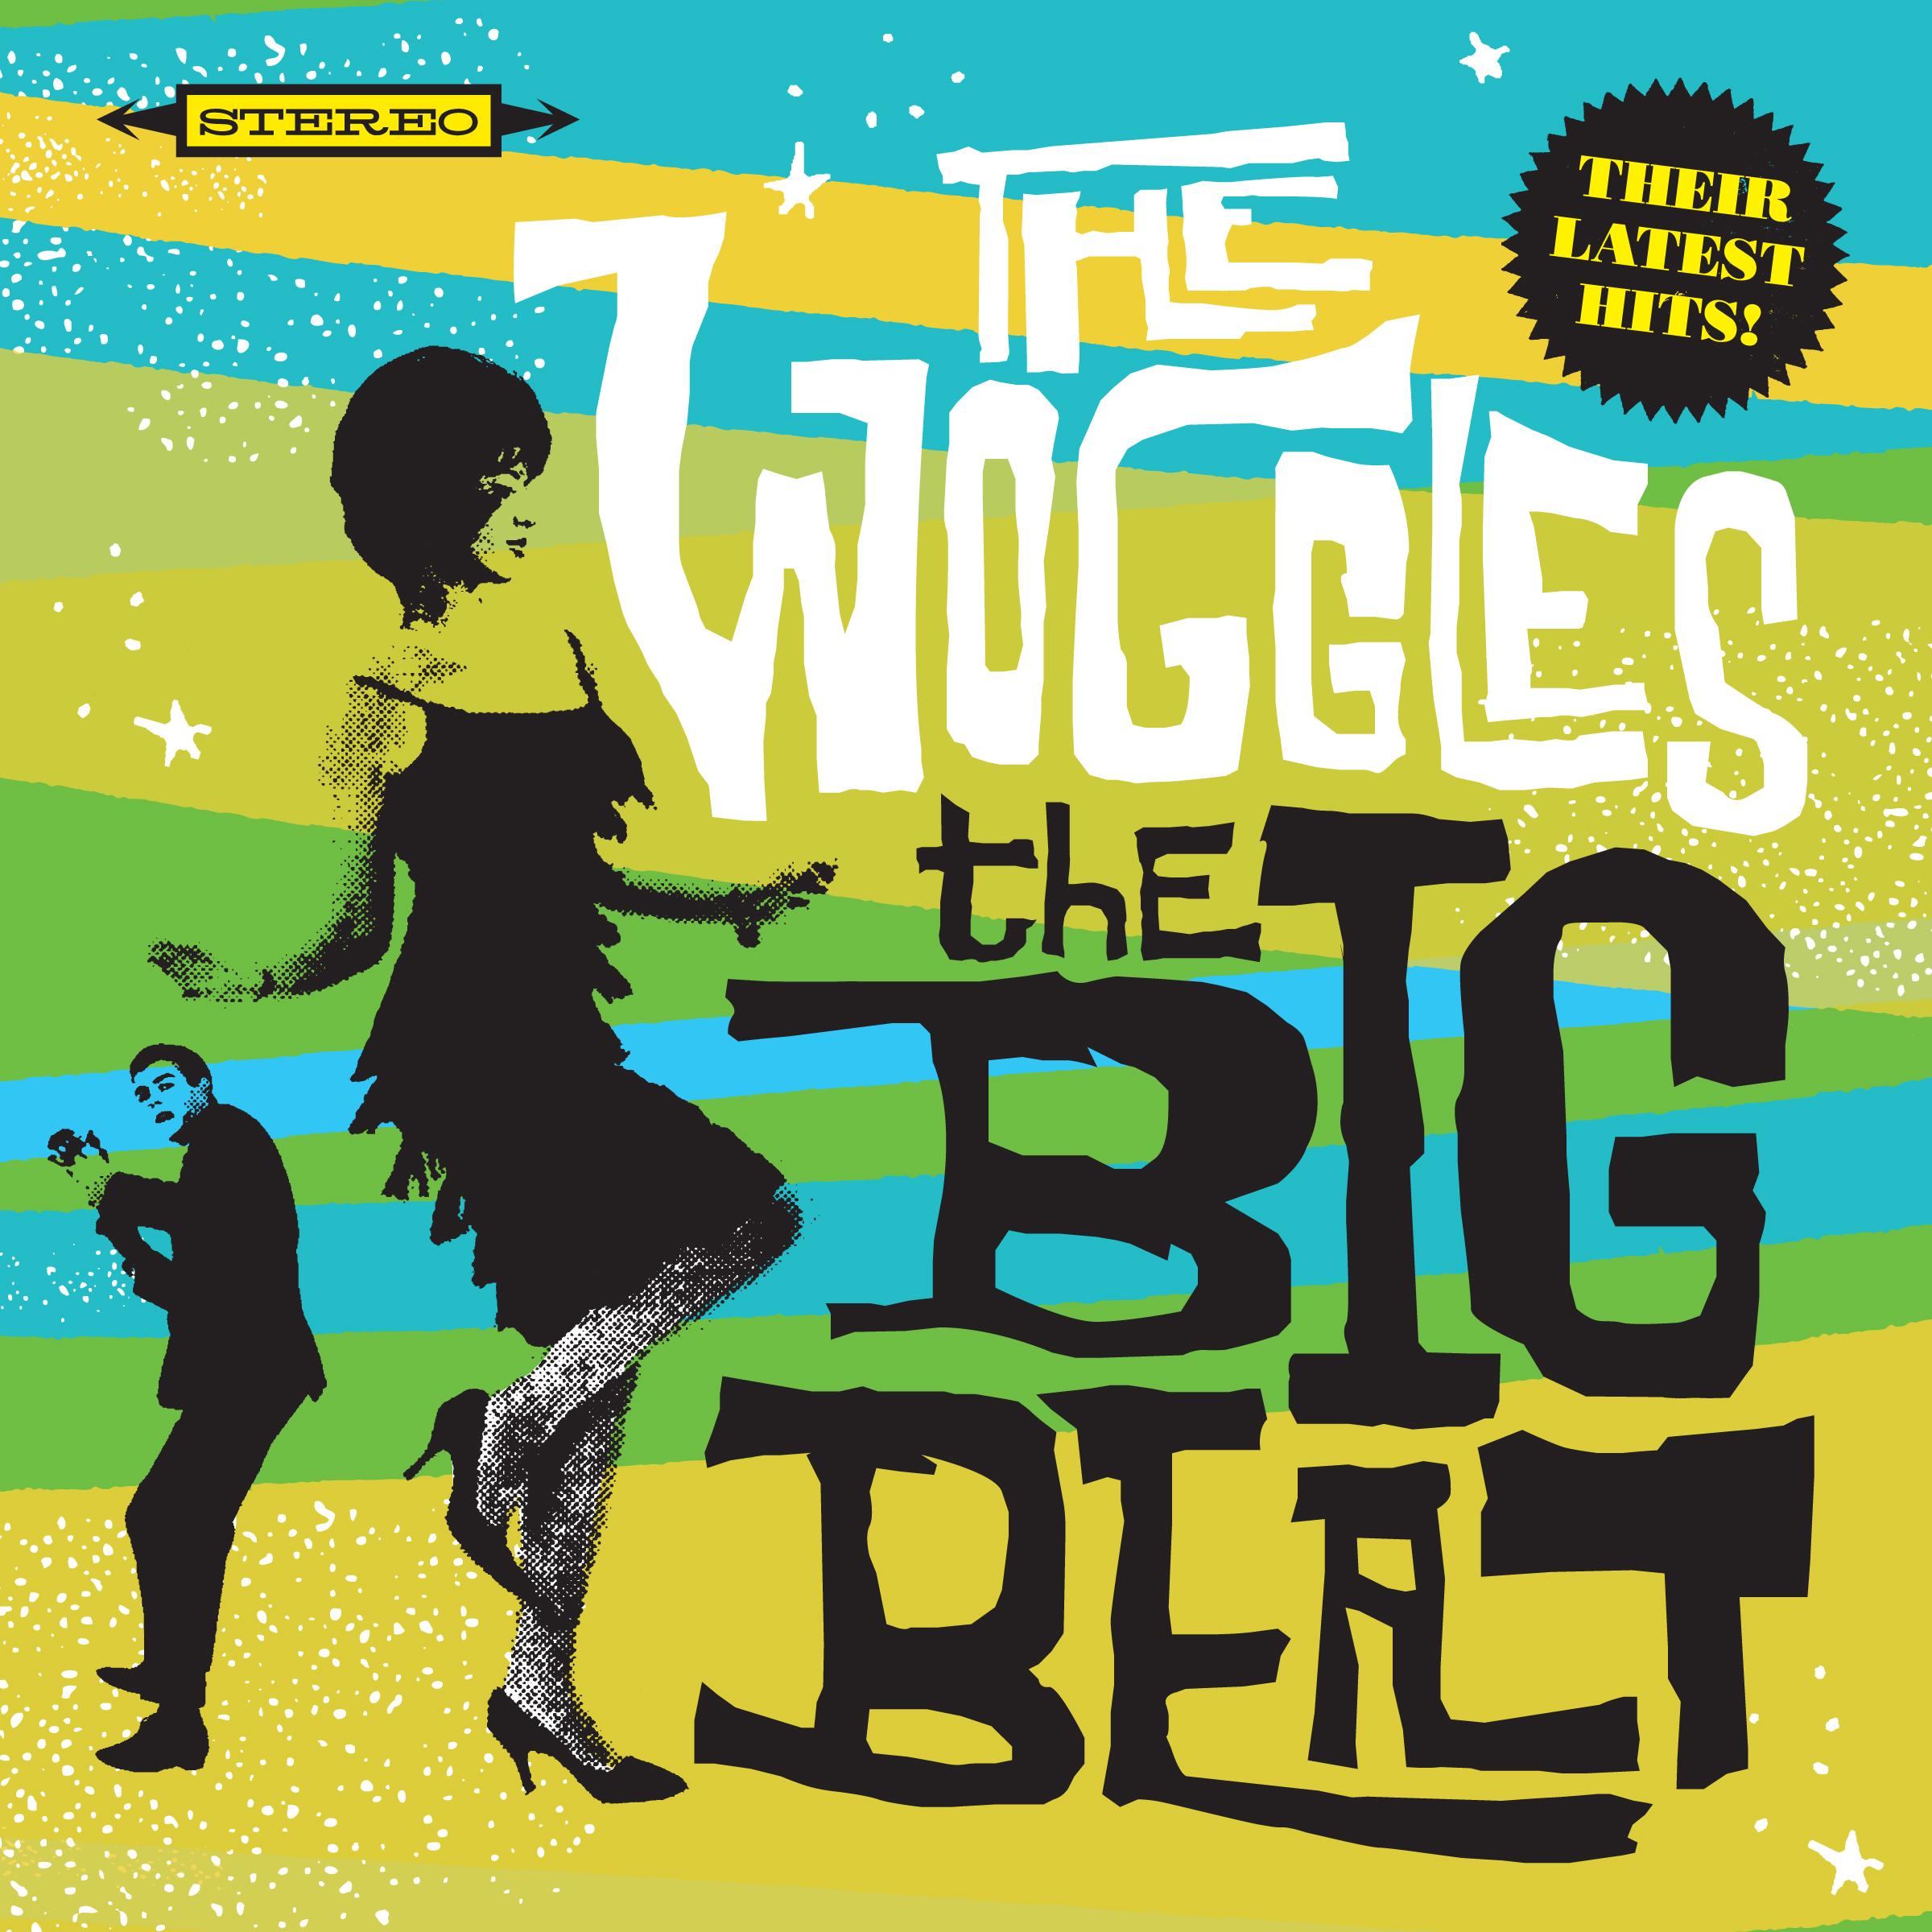 Caption: The Big Beat, Credit: Album Cover